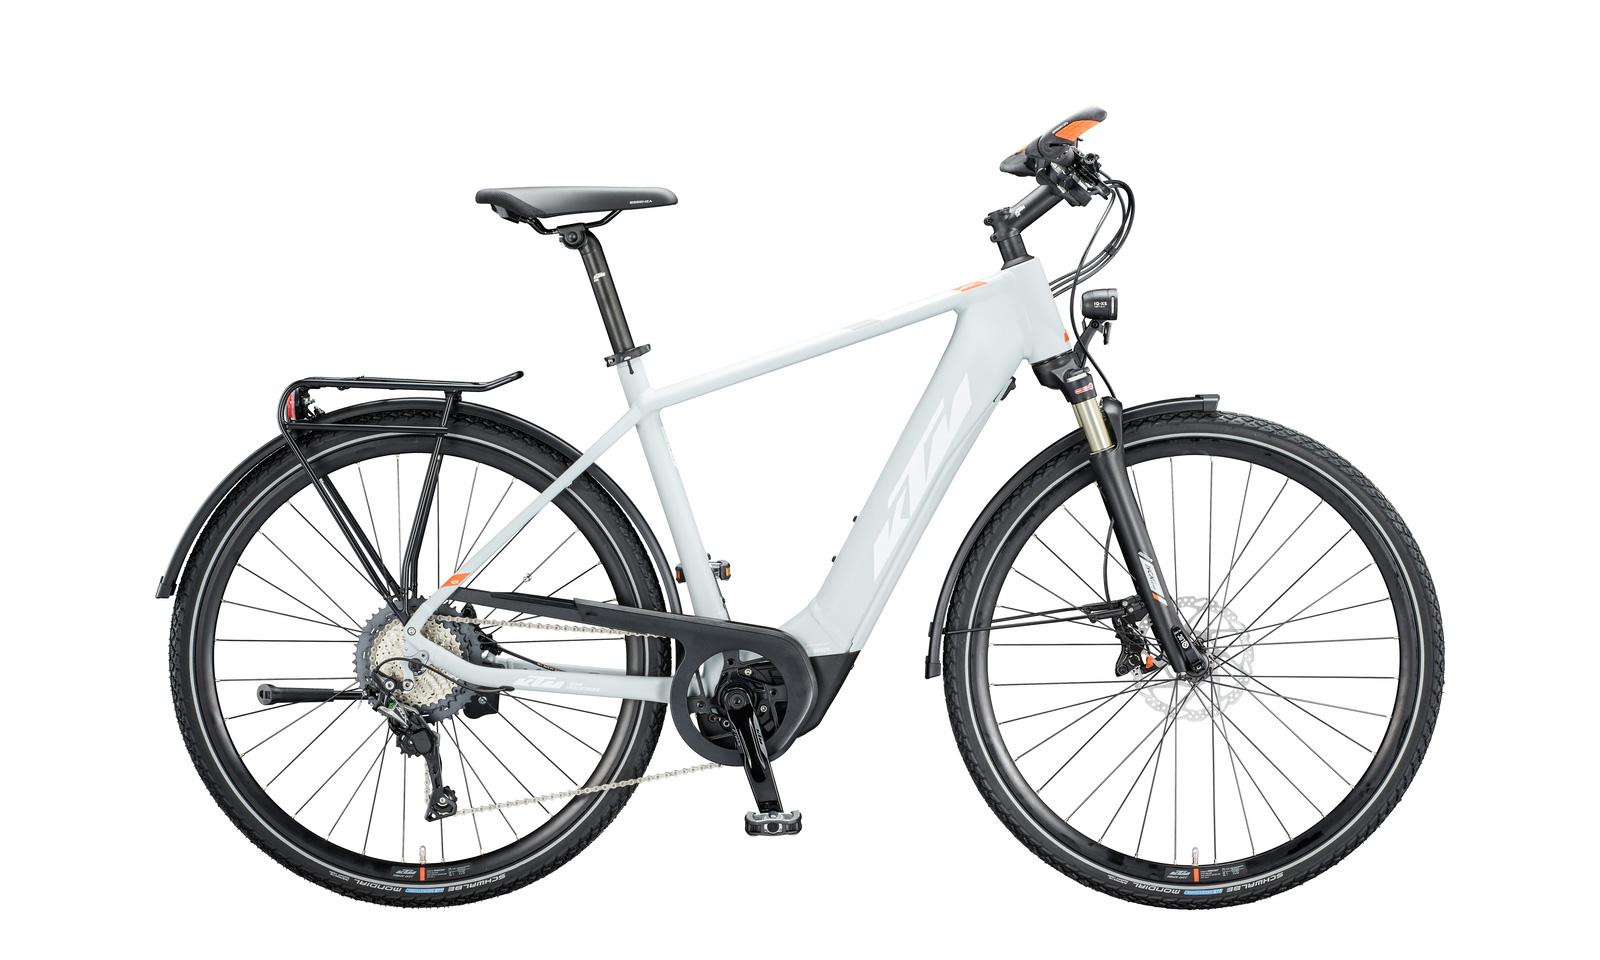 Biciclete electrice KTM E-Onroad MACINA SPORT 620 1x11 Shimano SLX